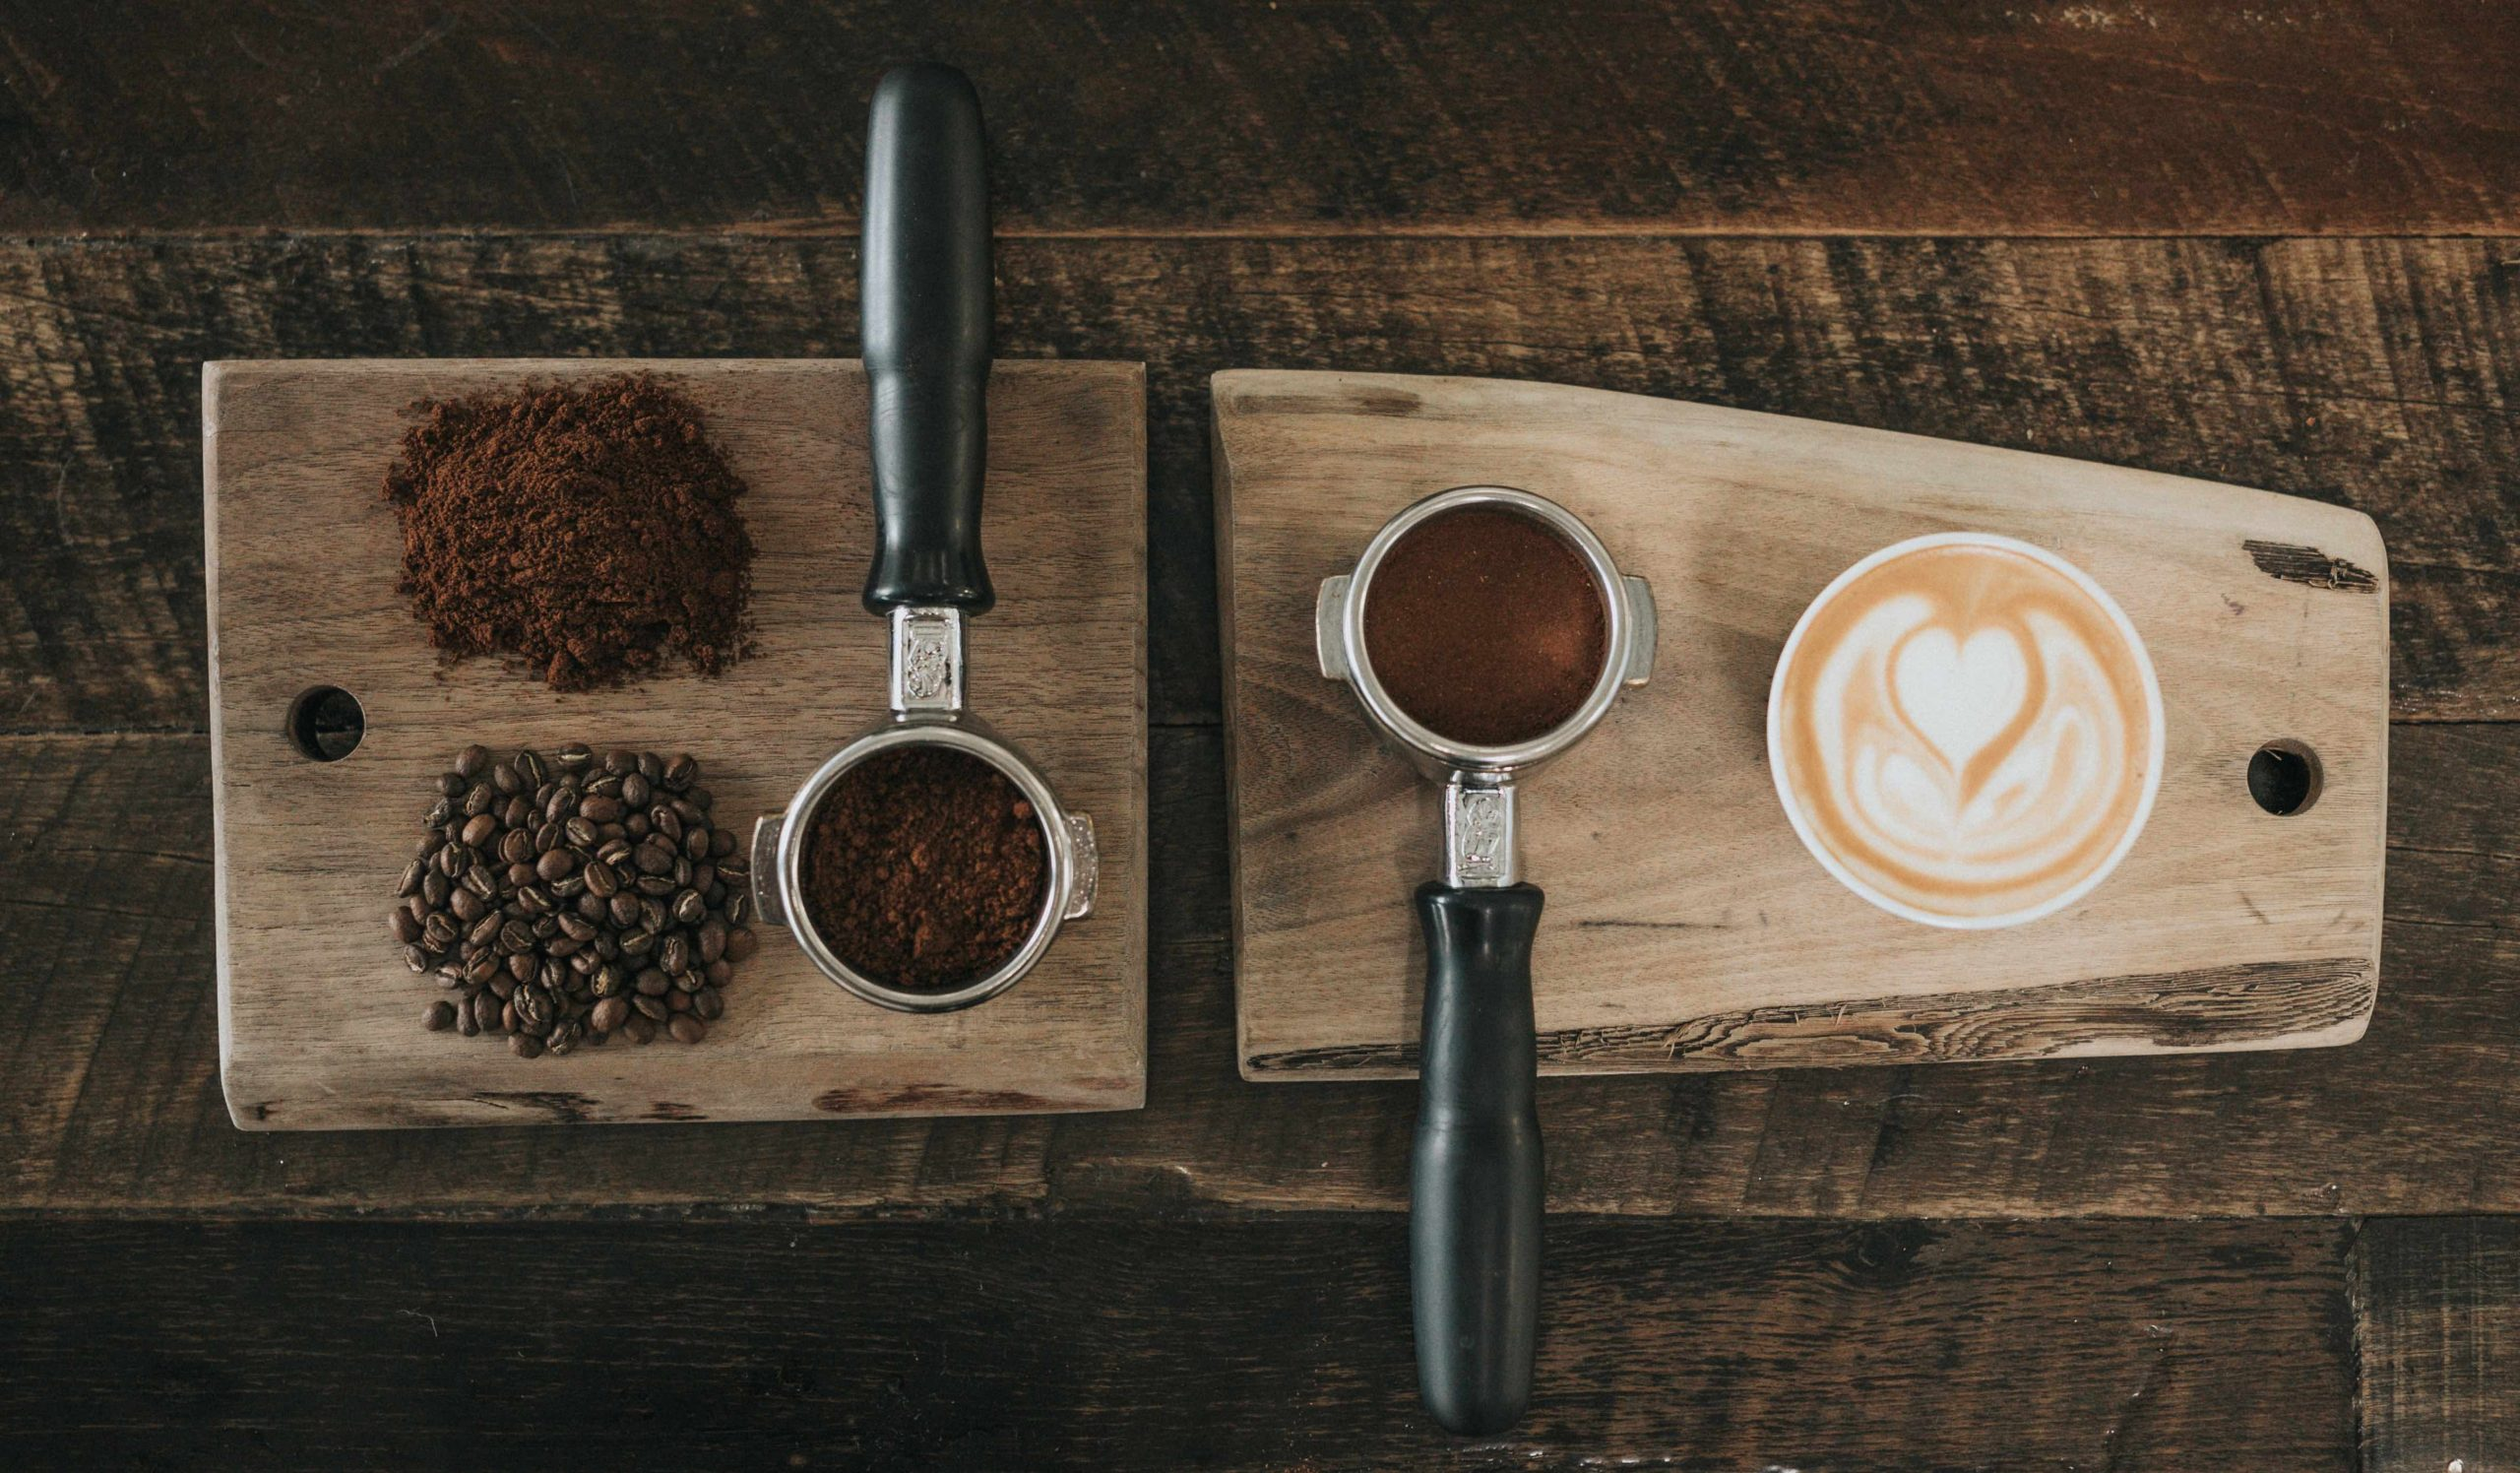 coffee ground up